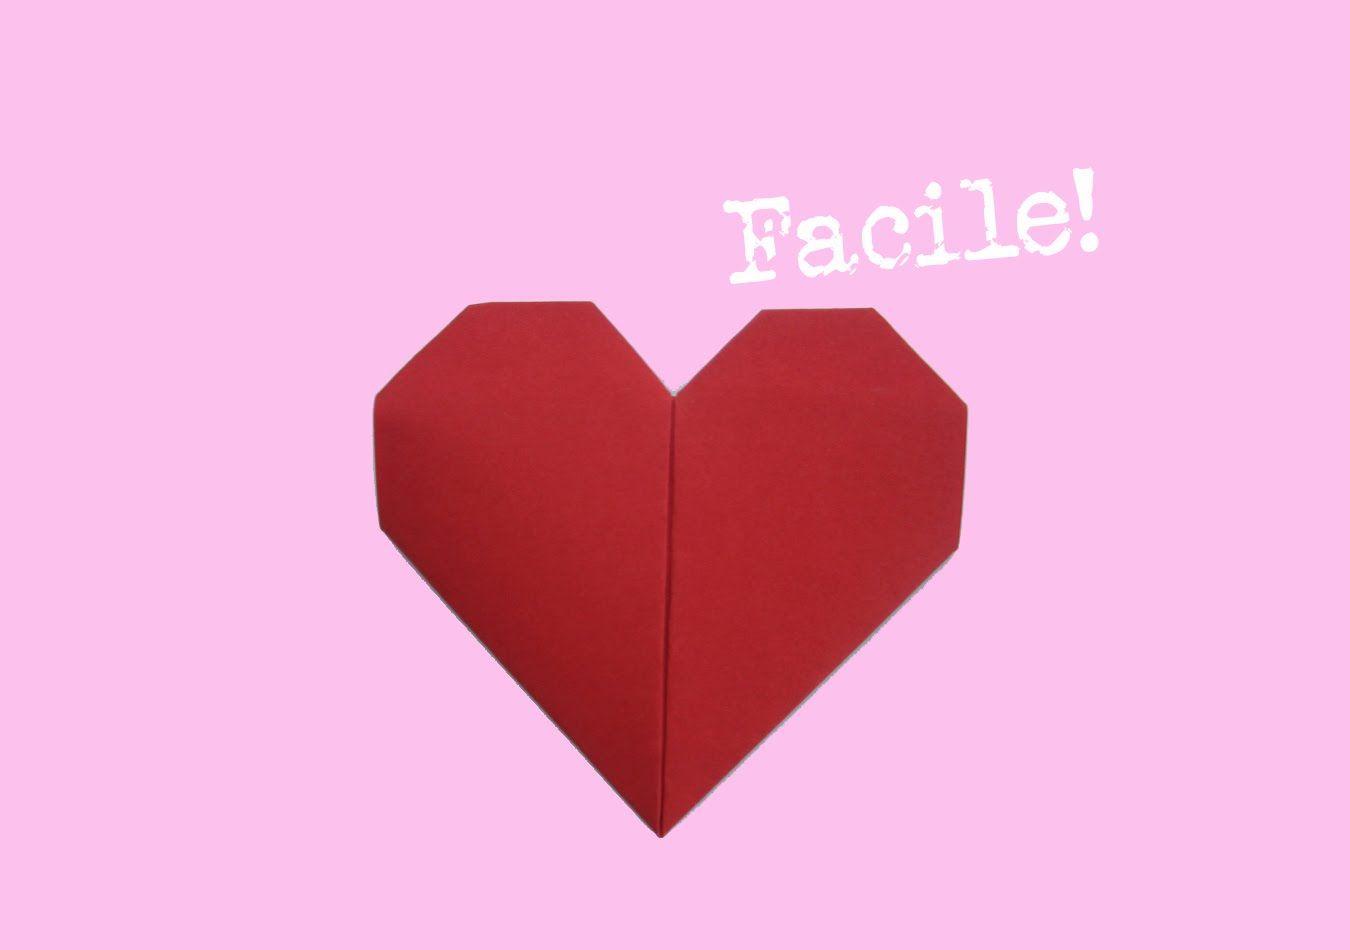 pliage coeur en papier - d'origami - facile - explication